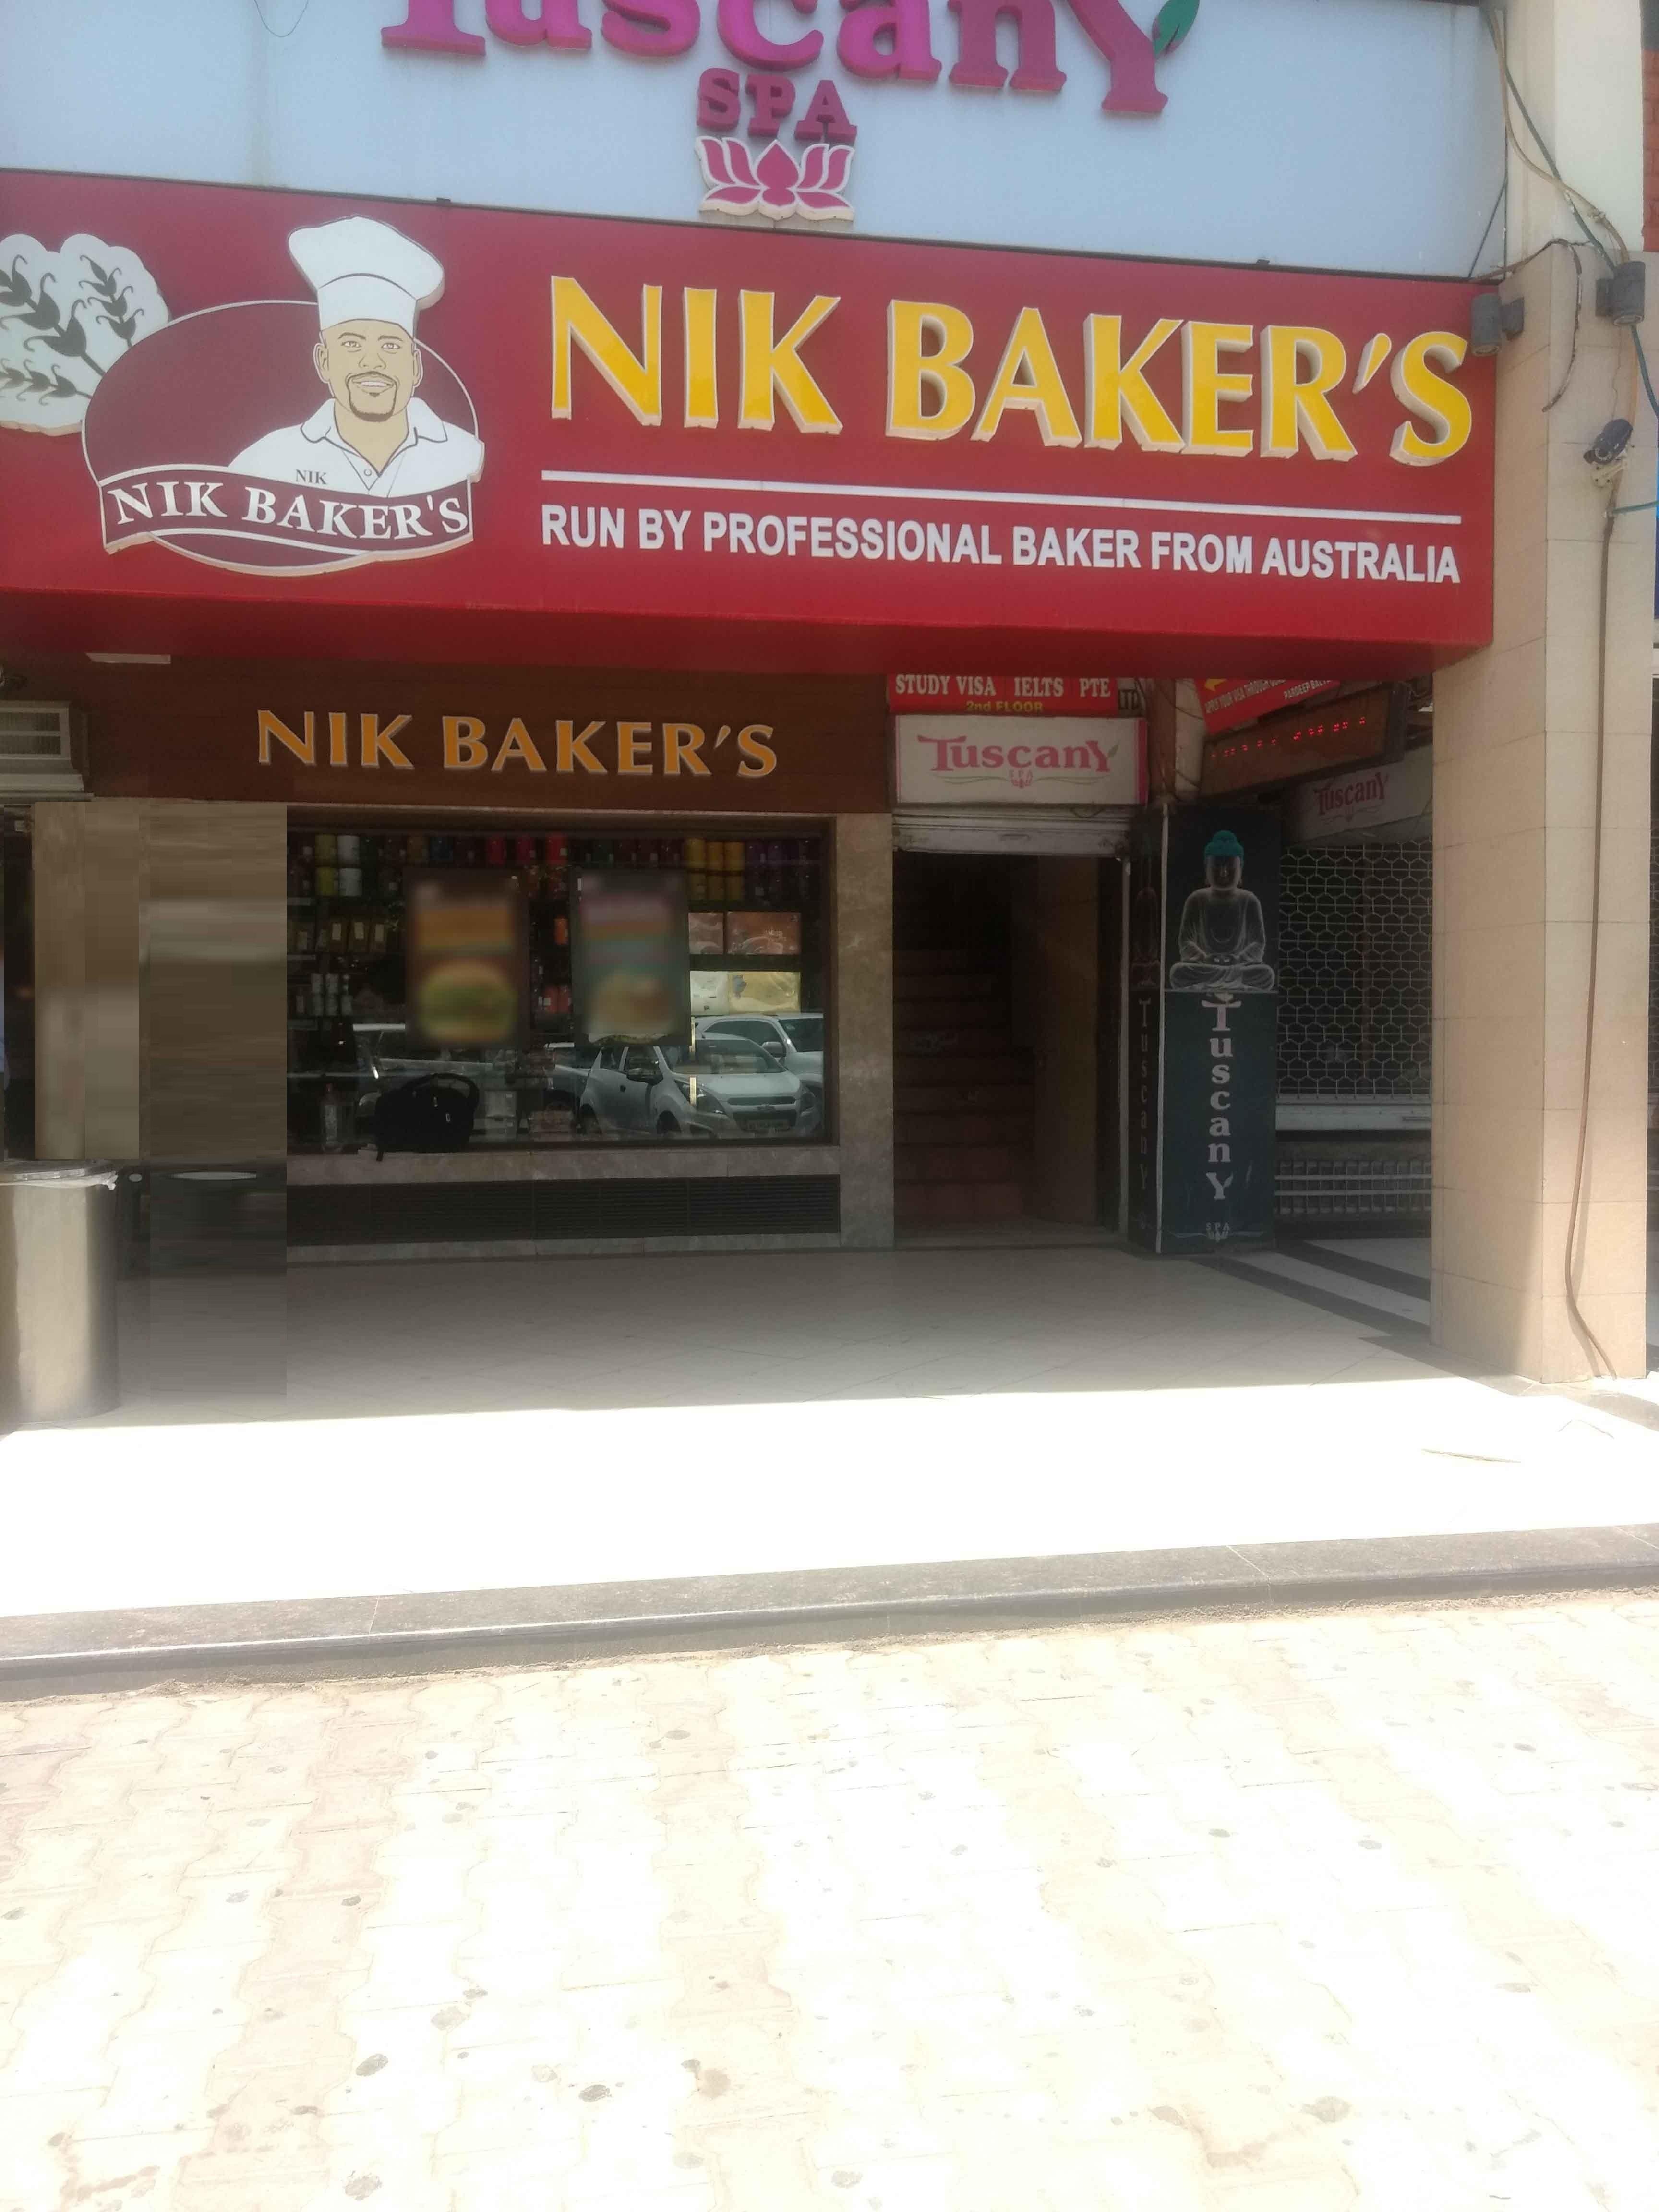 Nik Baker's - Sector 35C - Chandigarh Image